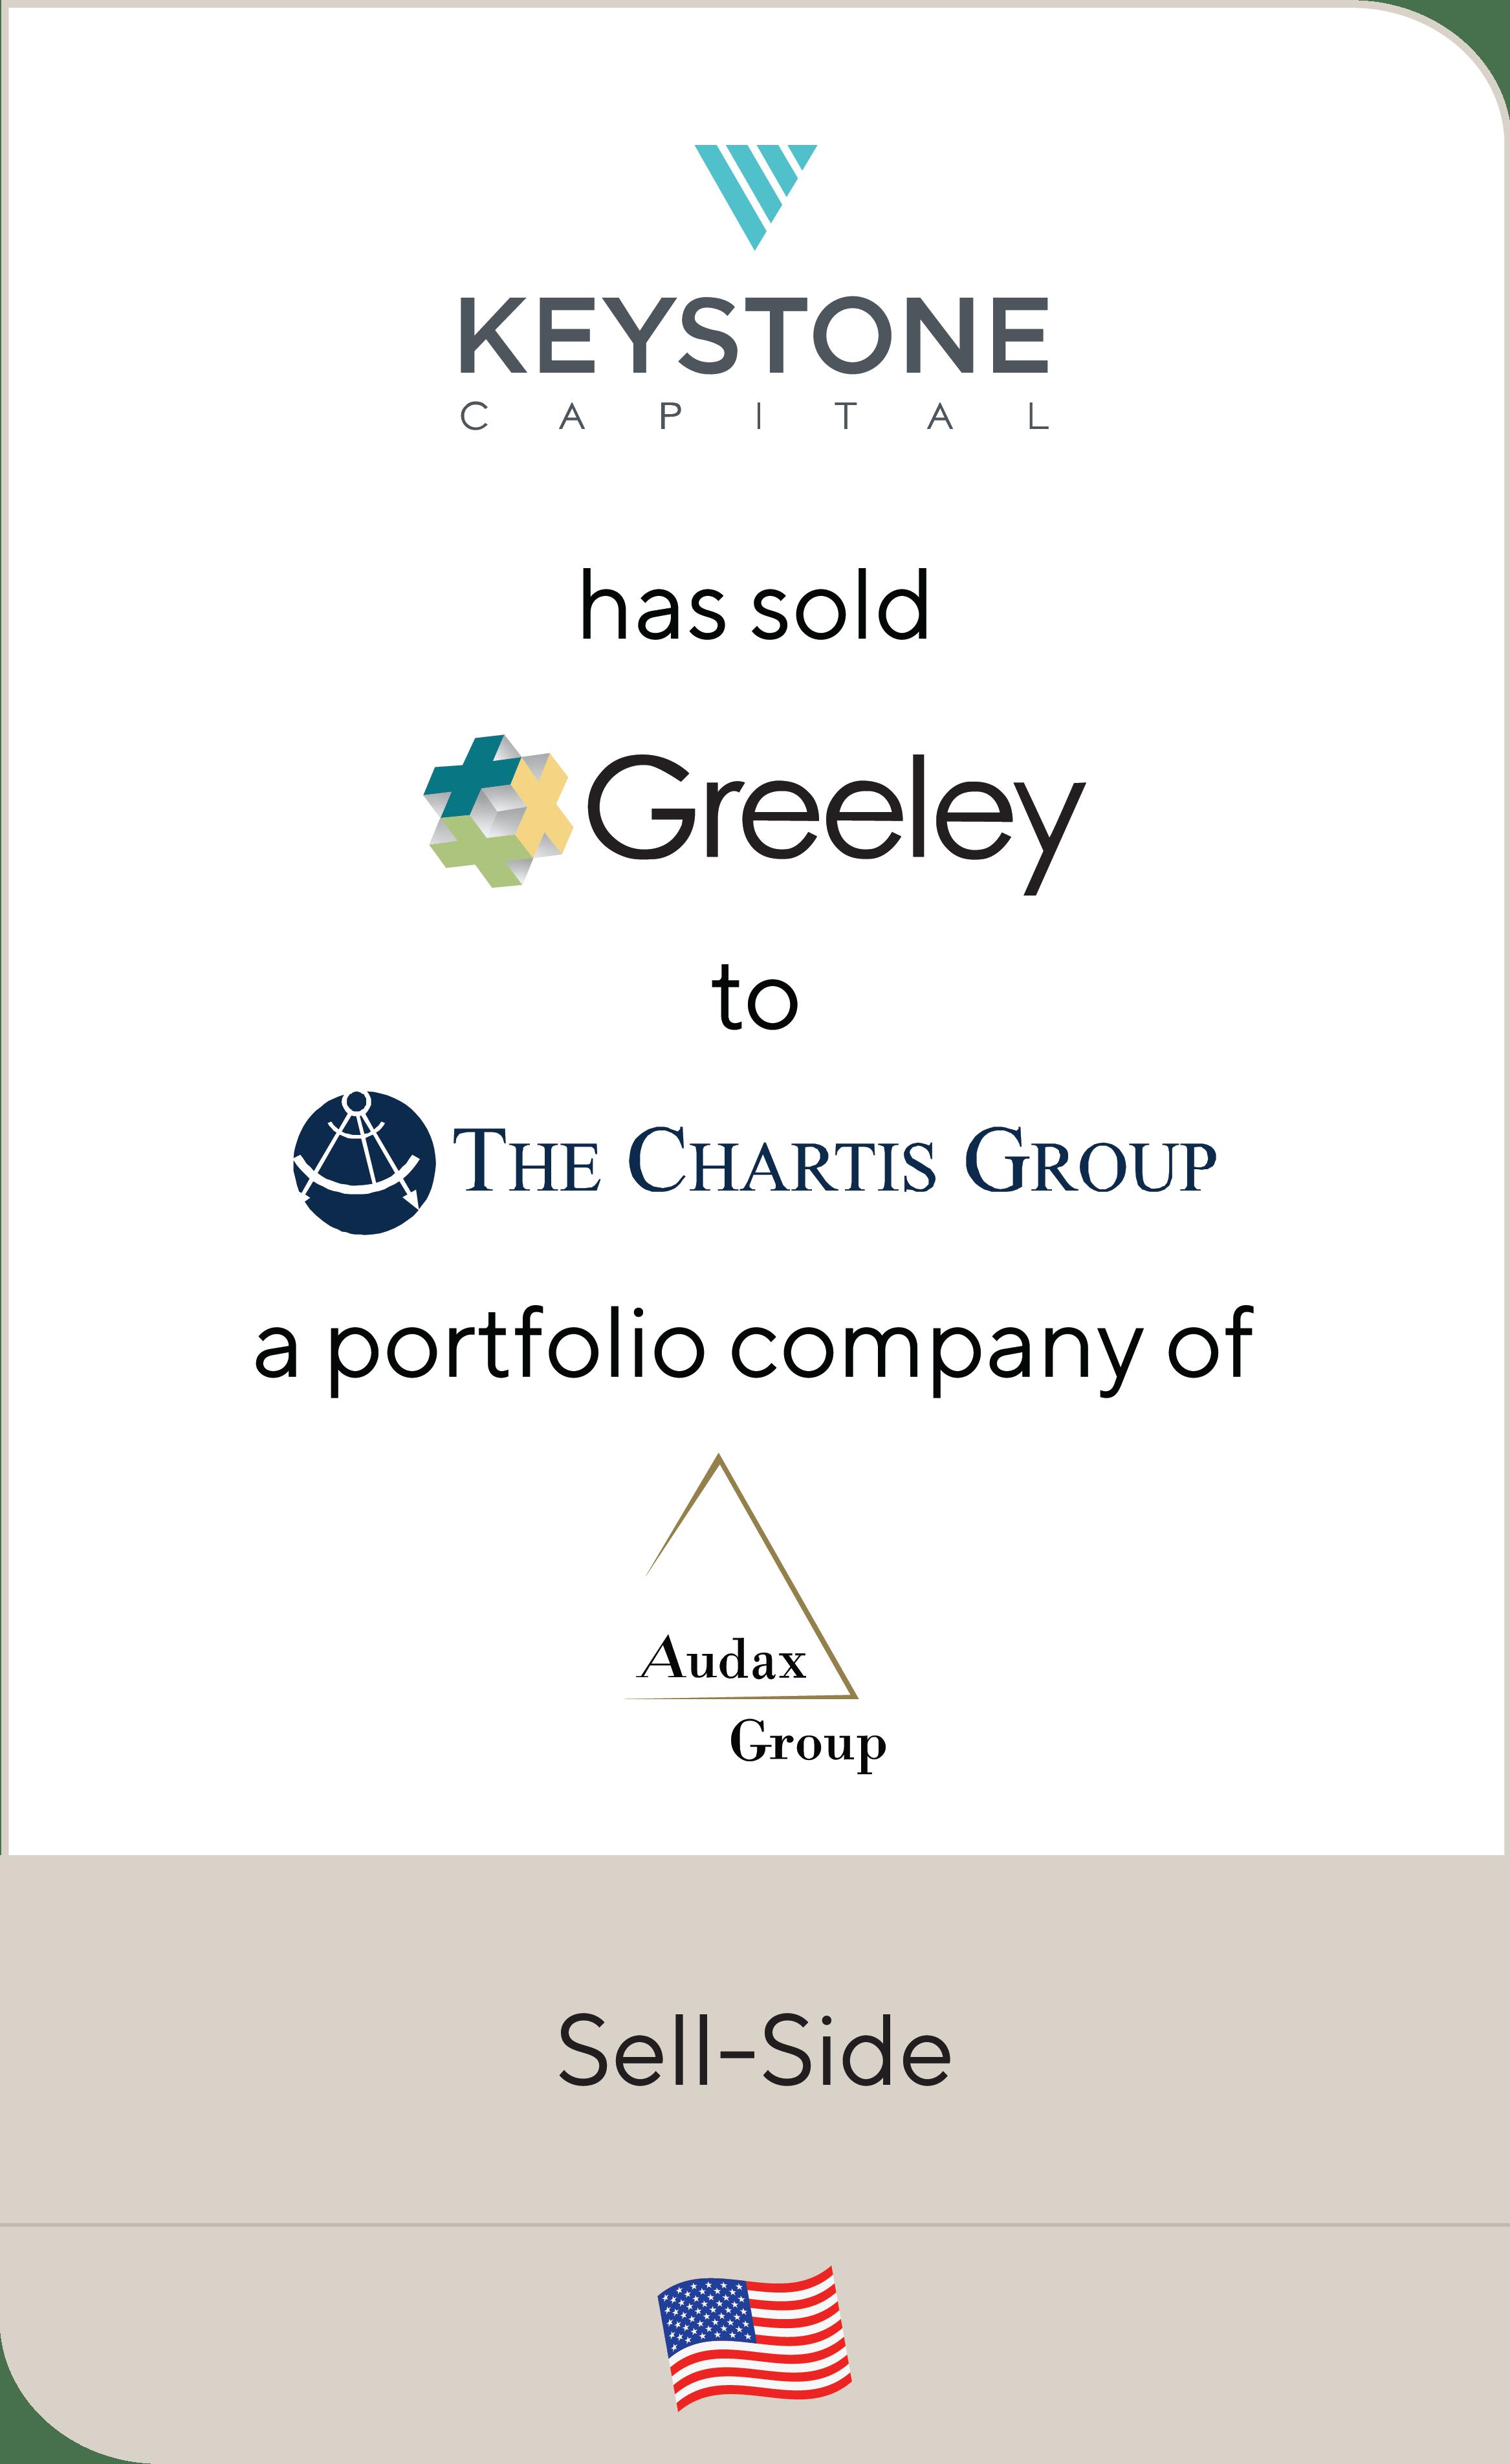 Keystone Greeley Chartis Audax 2019